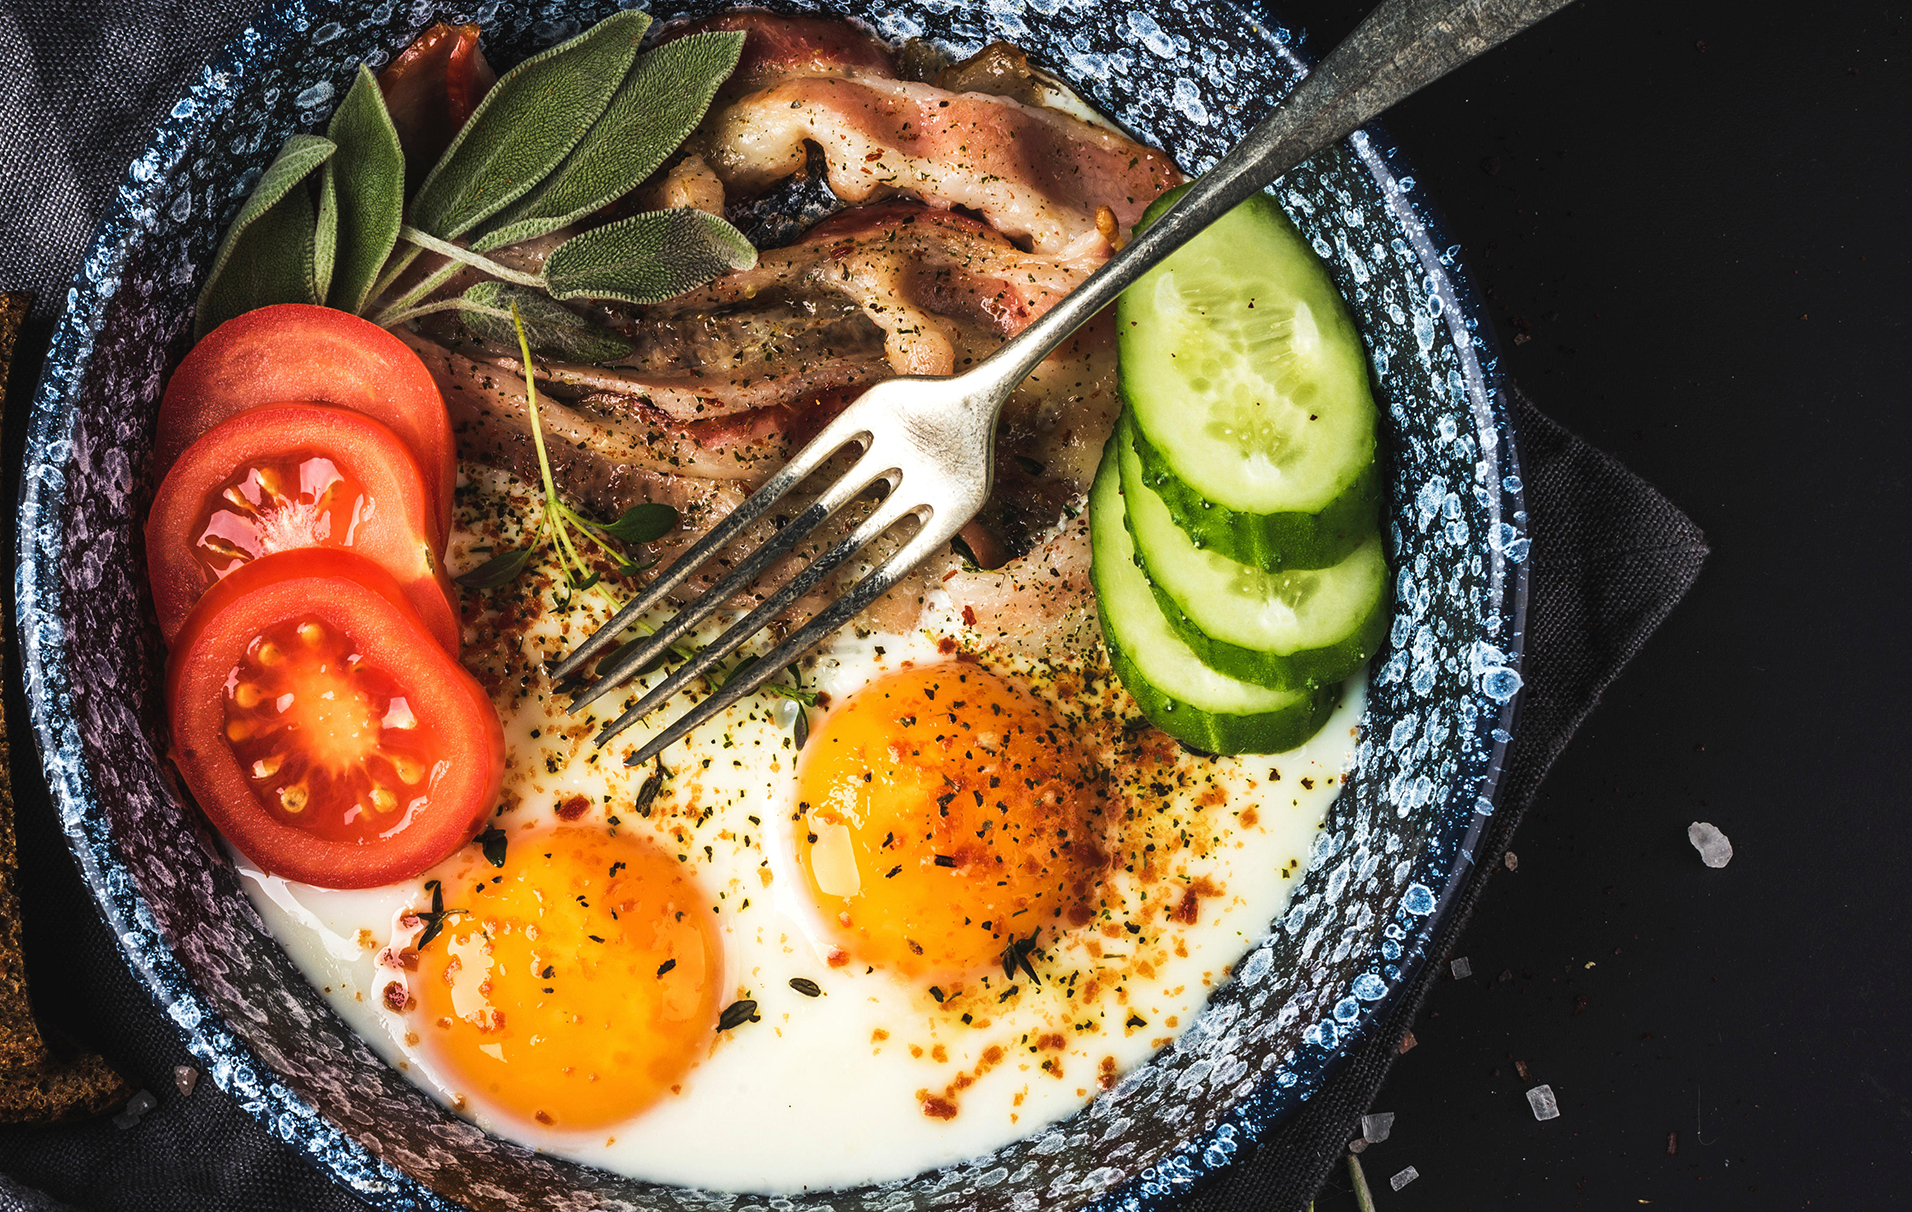 High protein breakfast: Healthy full English